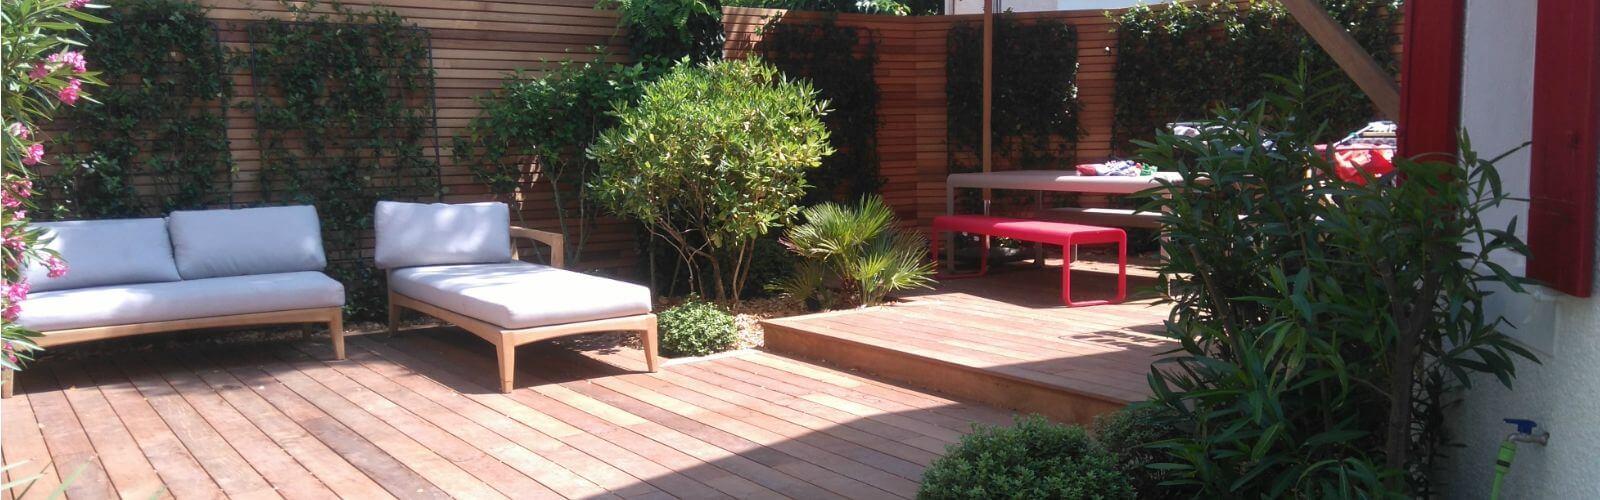 Terrasse en bois La Baule Escoublac